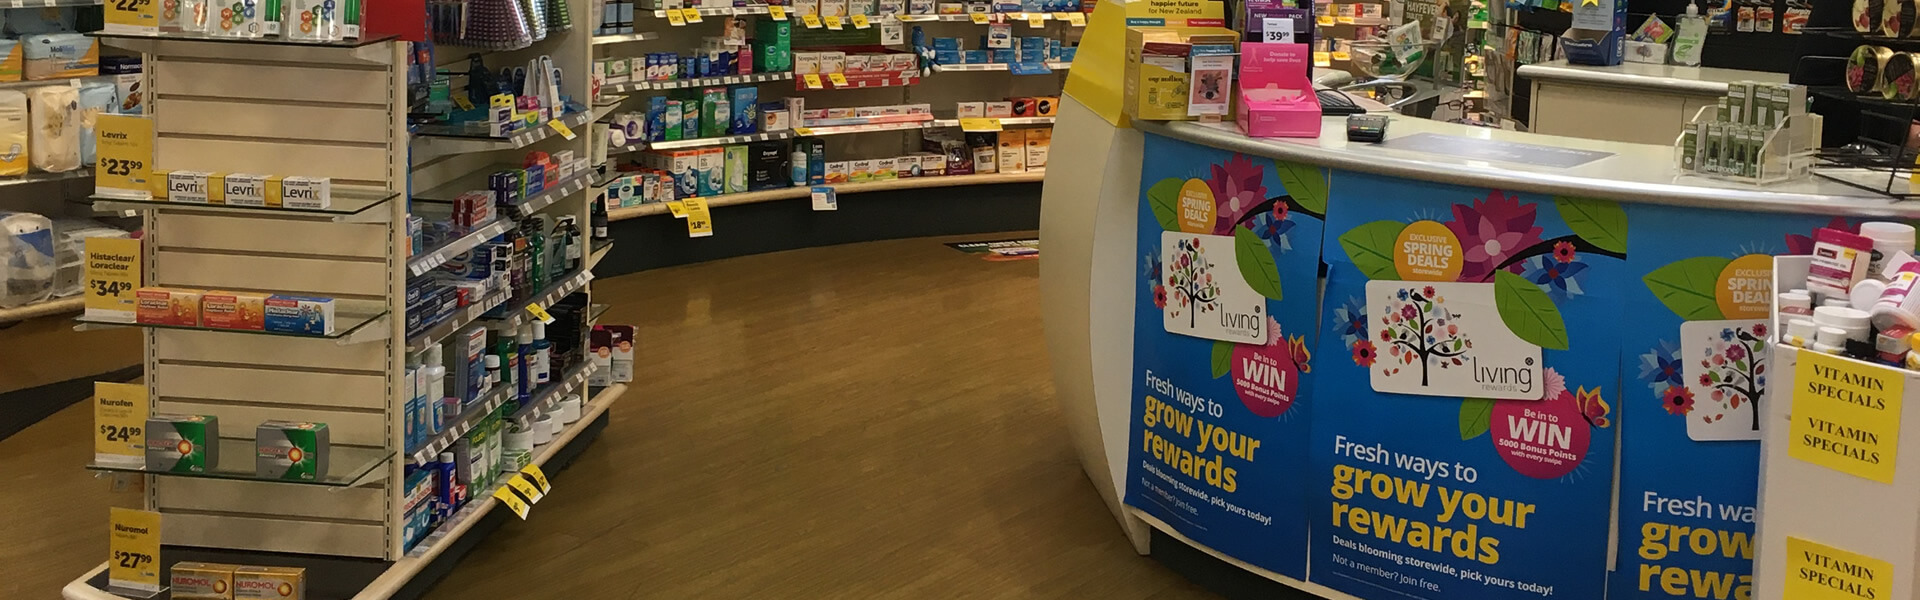 Store Interior 04 At Life Pharmacy Blenheim In Marlborough NZ